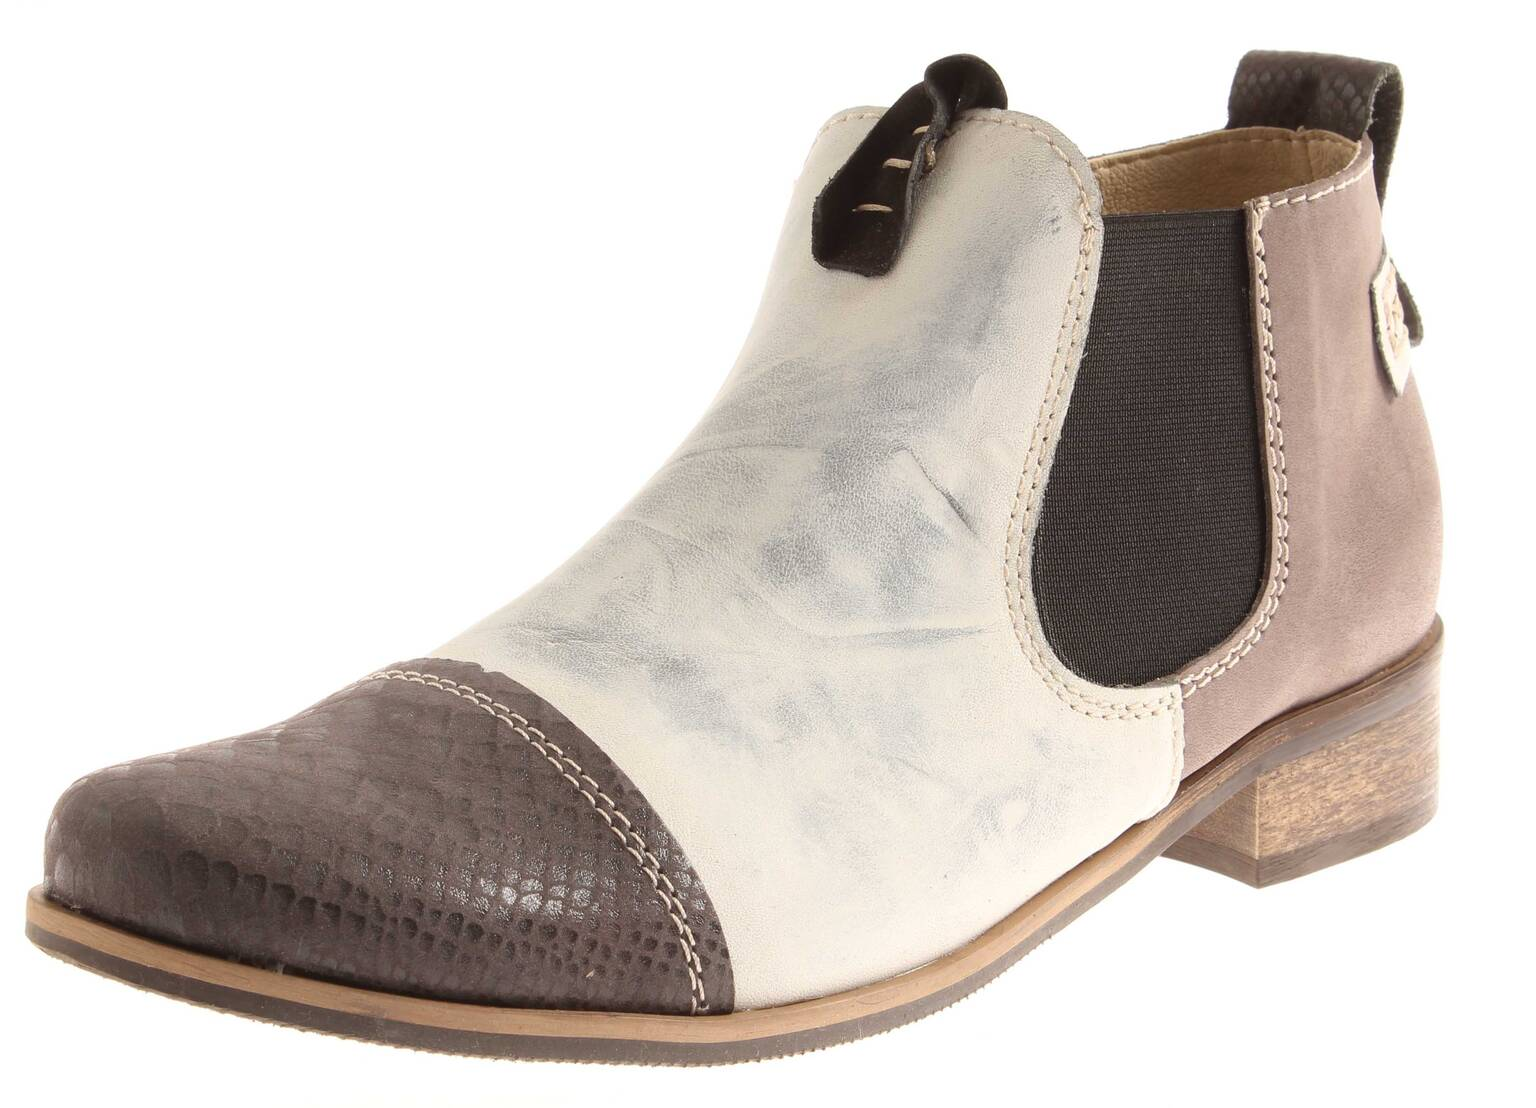 low priced bb5a0 230d7 Detalles de Miccos Clásico Chelsea Boots Botines Zapatos Piel Mujer